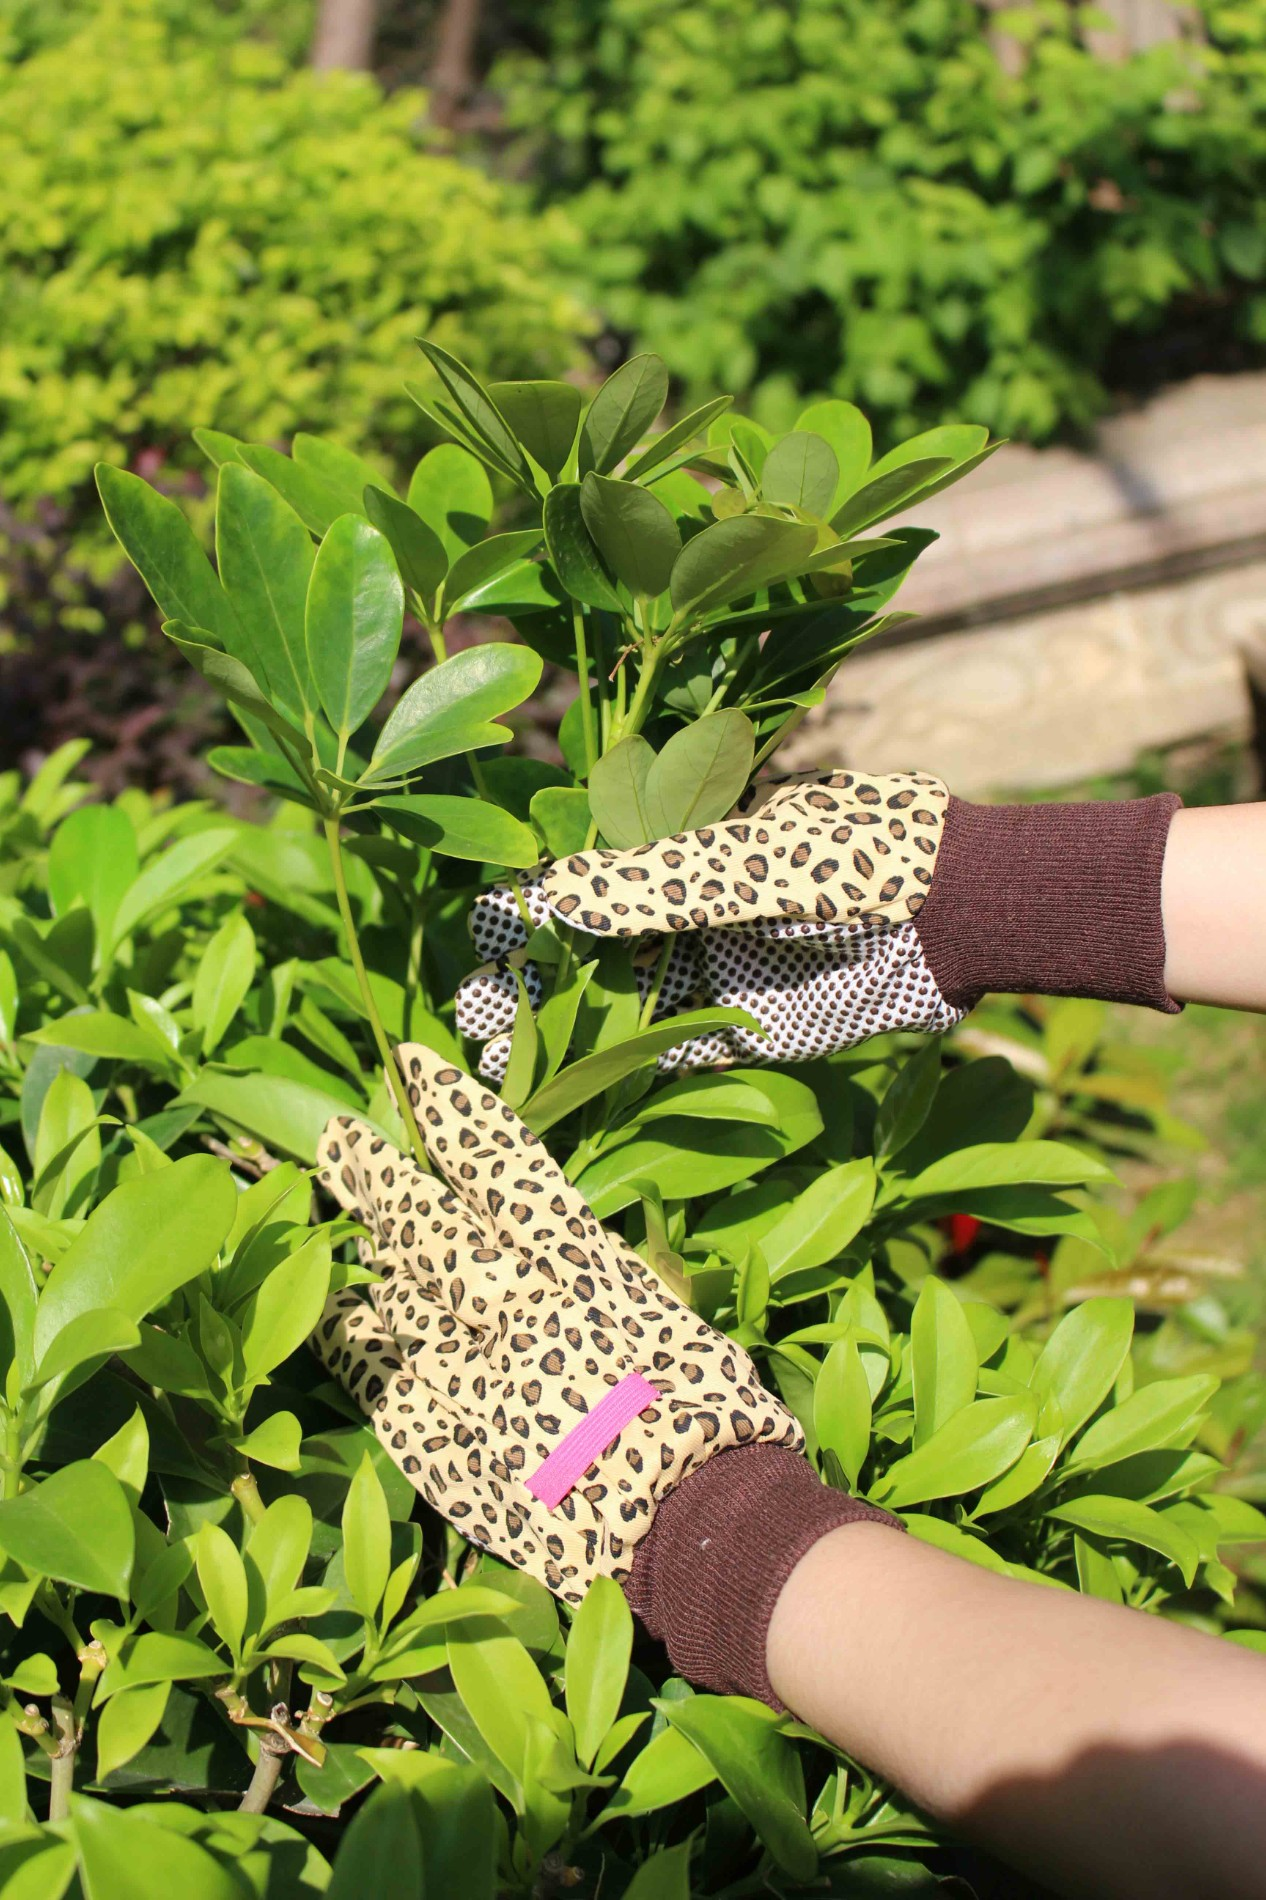 Koop Leopard Garden Gloves. Leopard Garden Gloves Prijzen. Leopard Garden Gloves Brands. Leopard Garden Gloves Fabrikant. Leopard Garden Gloves Quotes. Leopard Garden Gloves Company.